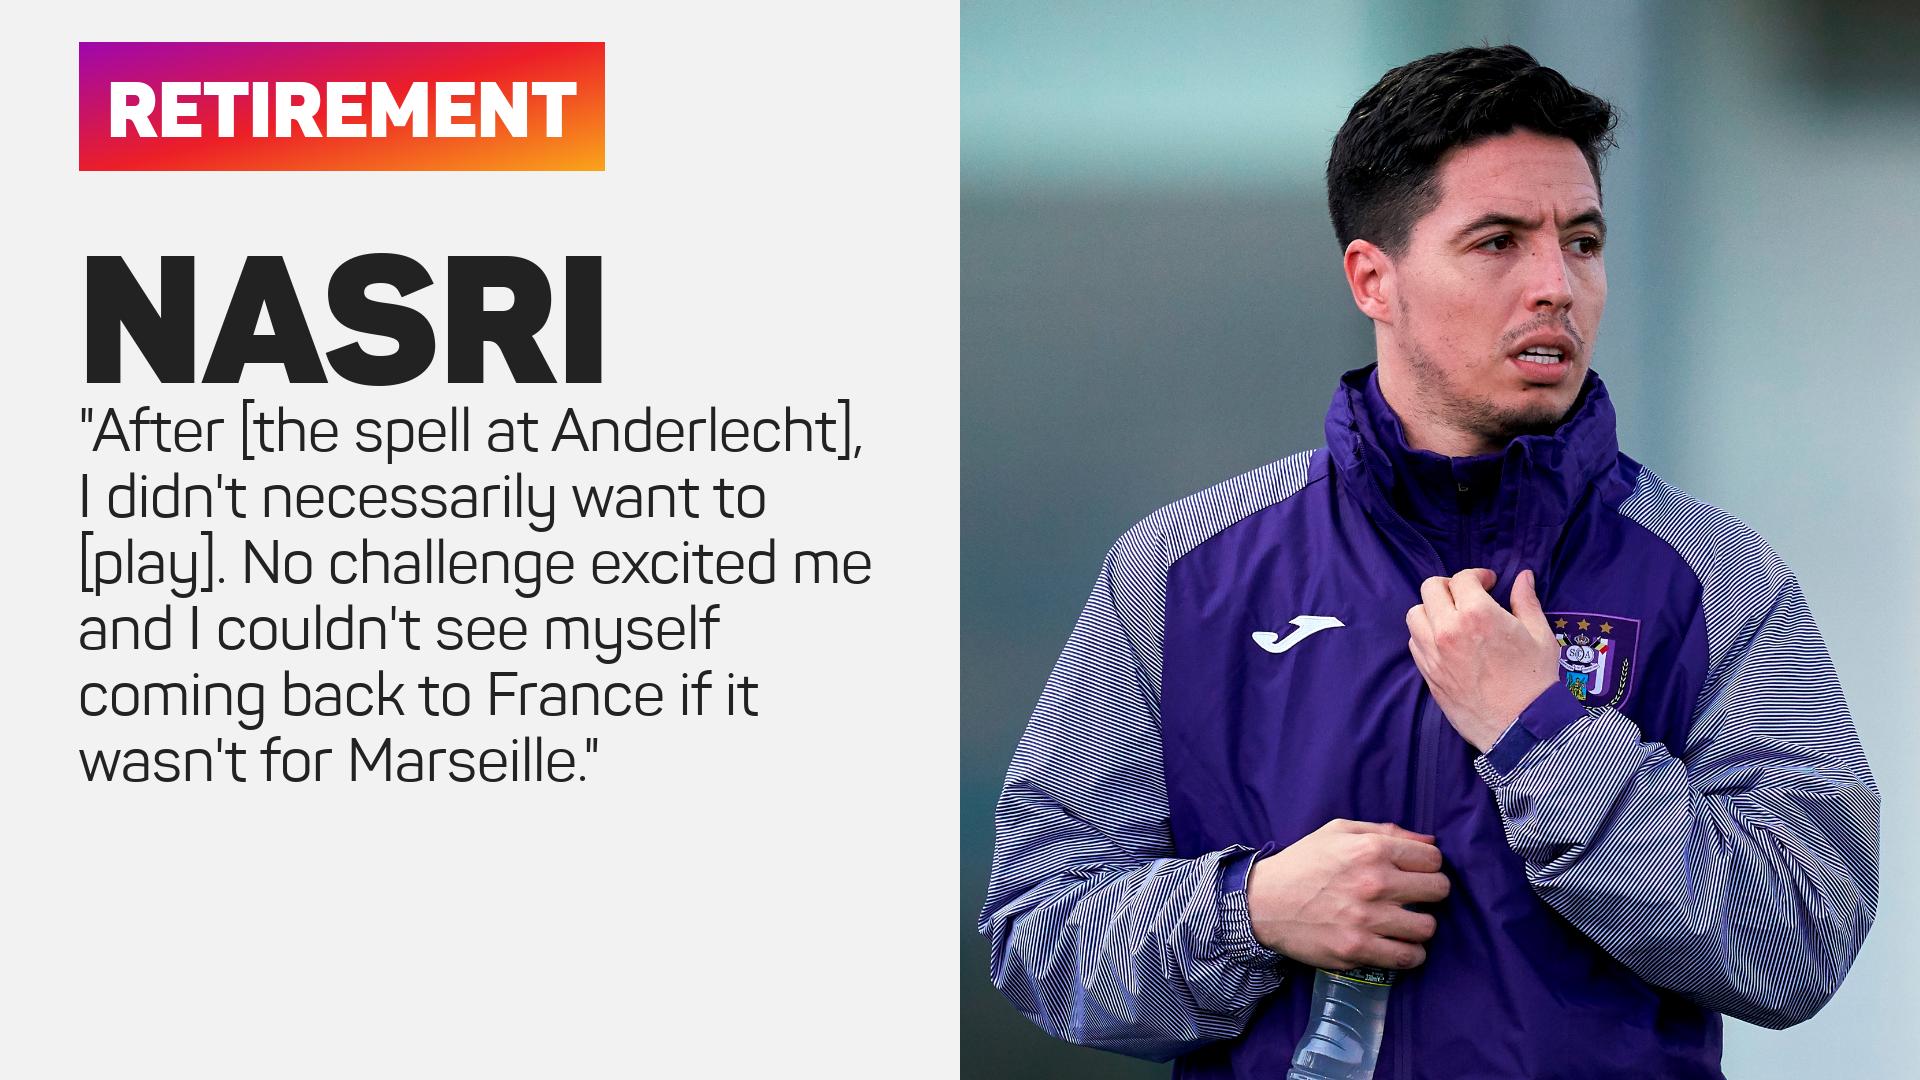 Samir Nasri explained his decision to retire